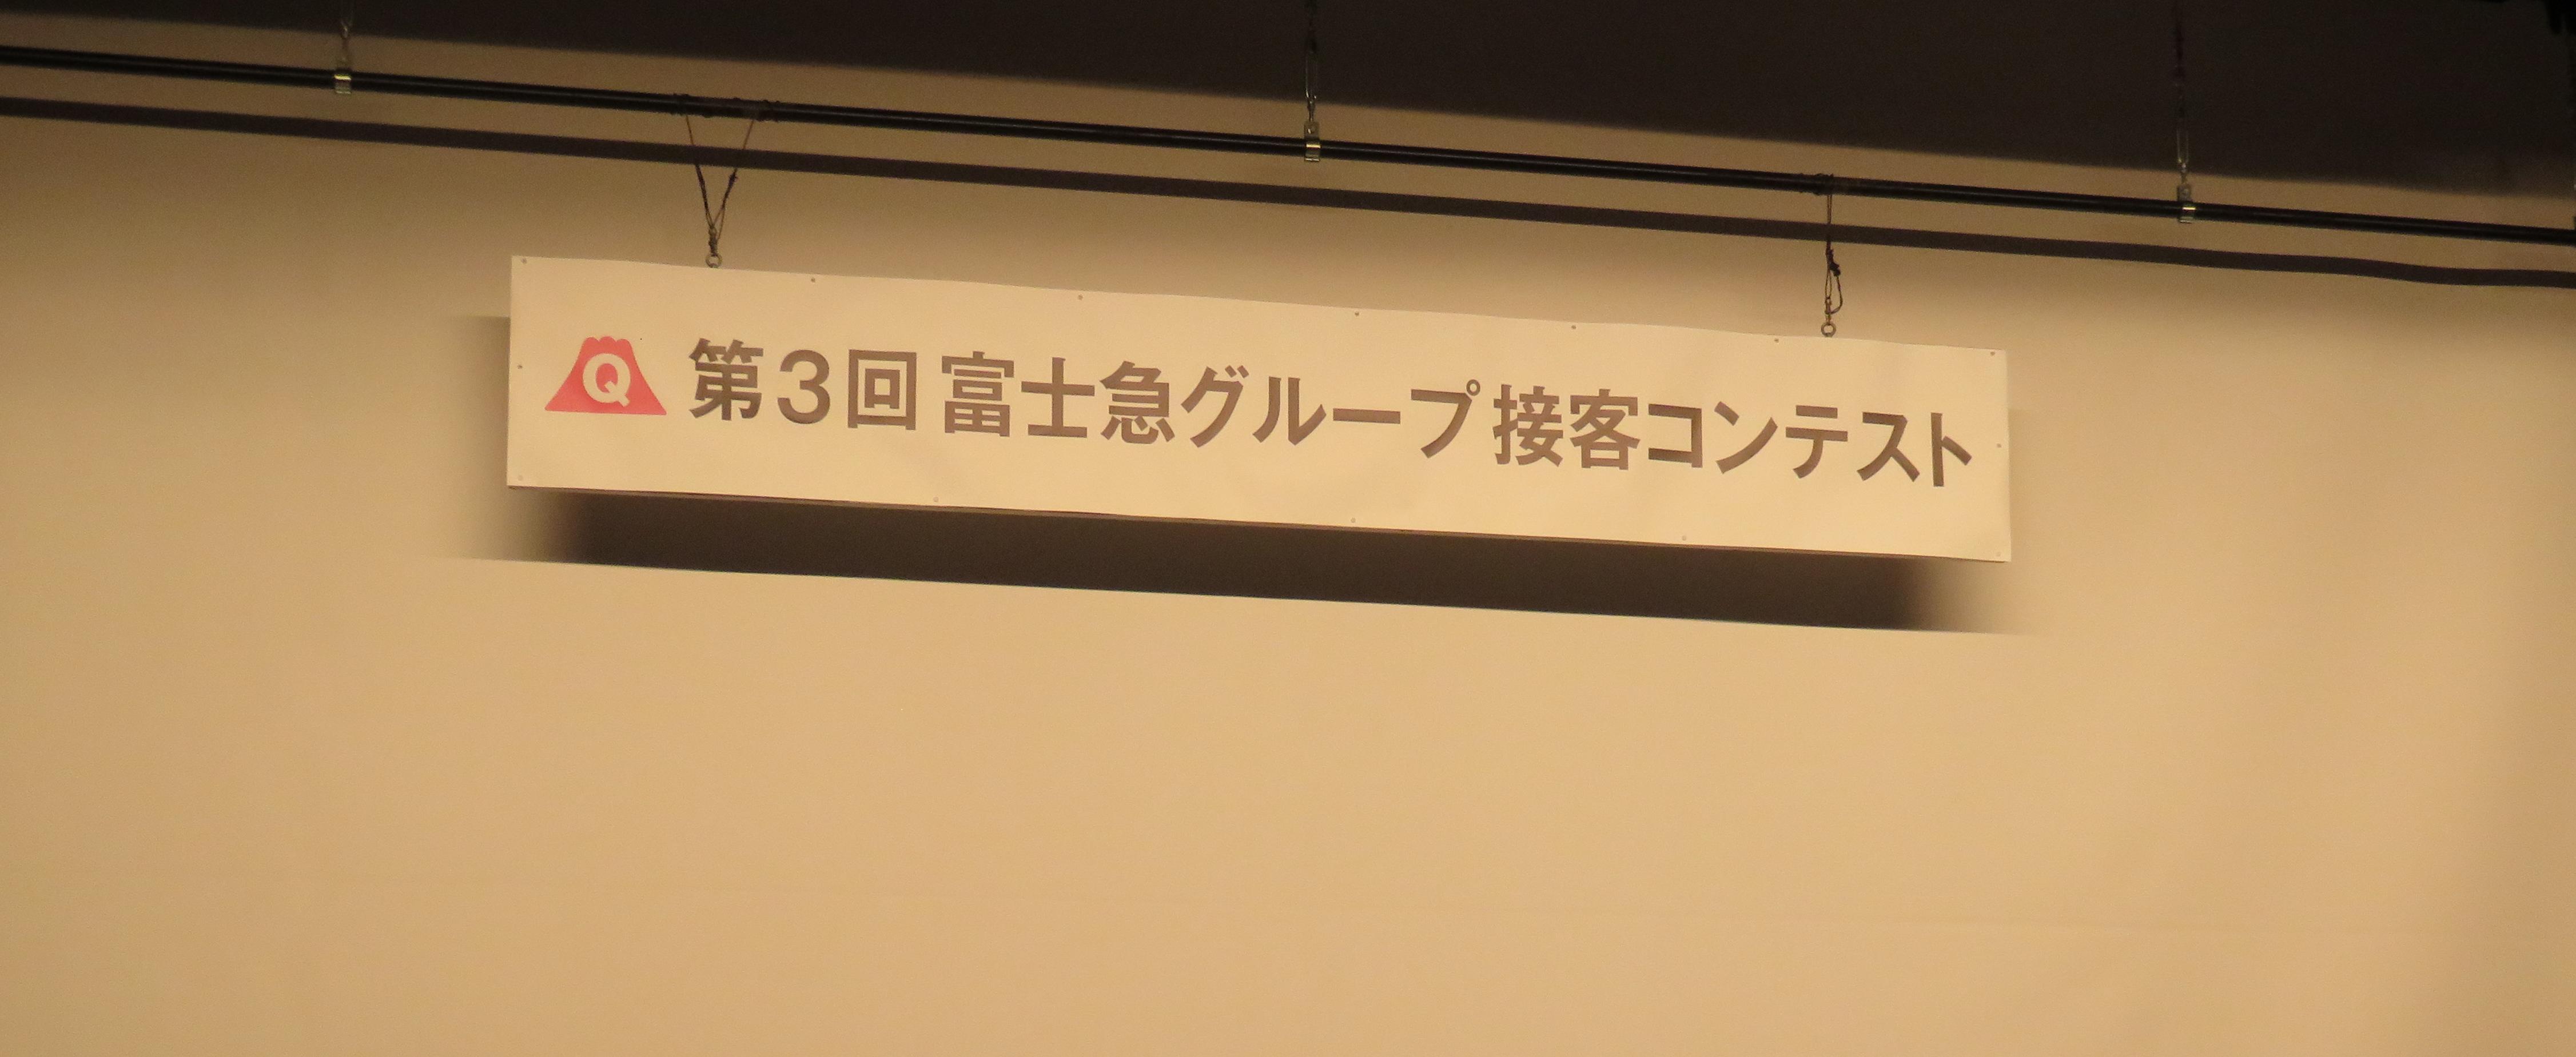 http://www.yamanashi-kankou.jp/blog/IMG_1778%EF%BD%A52.png